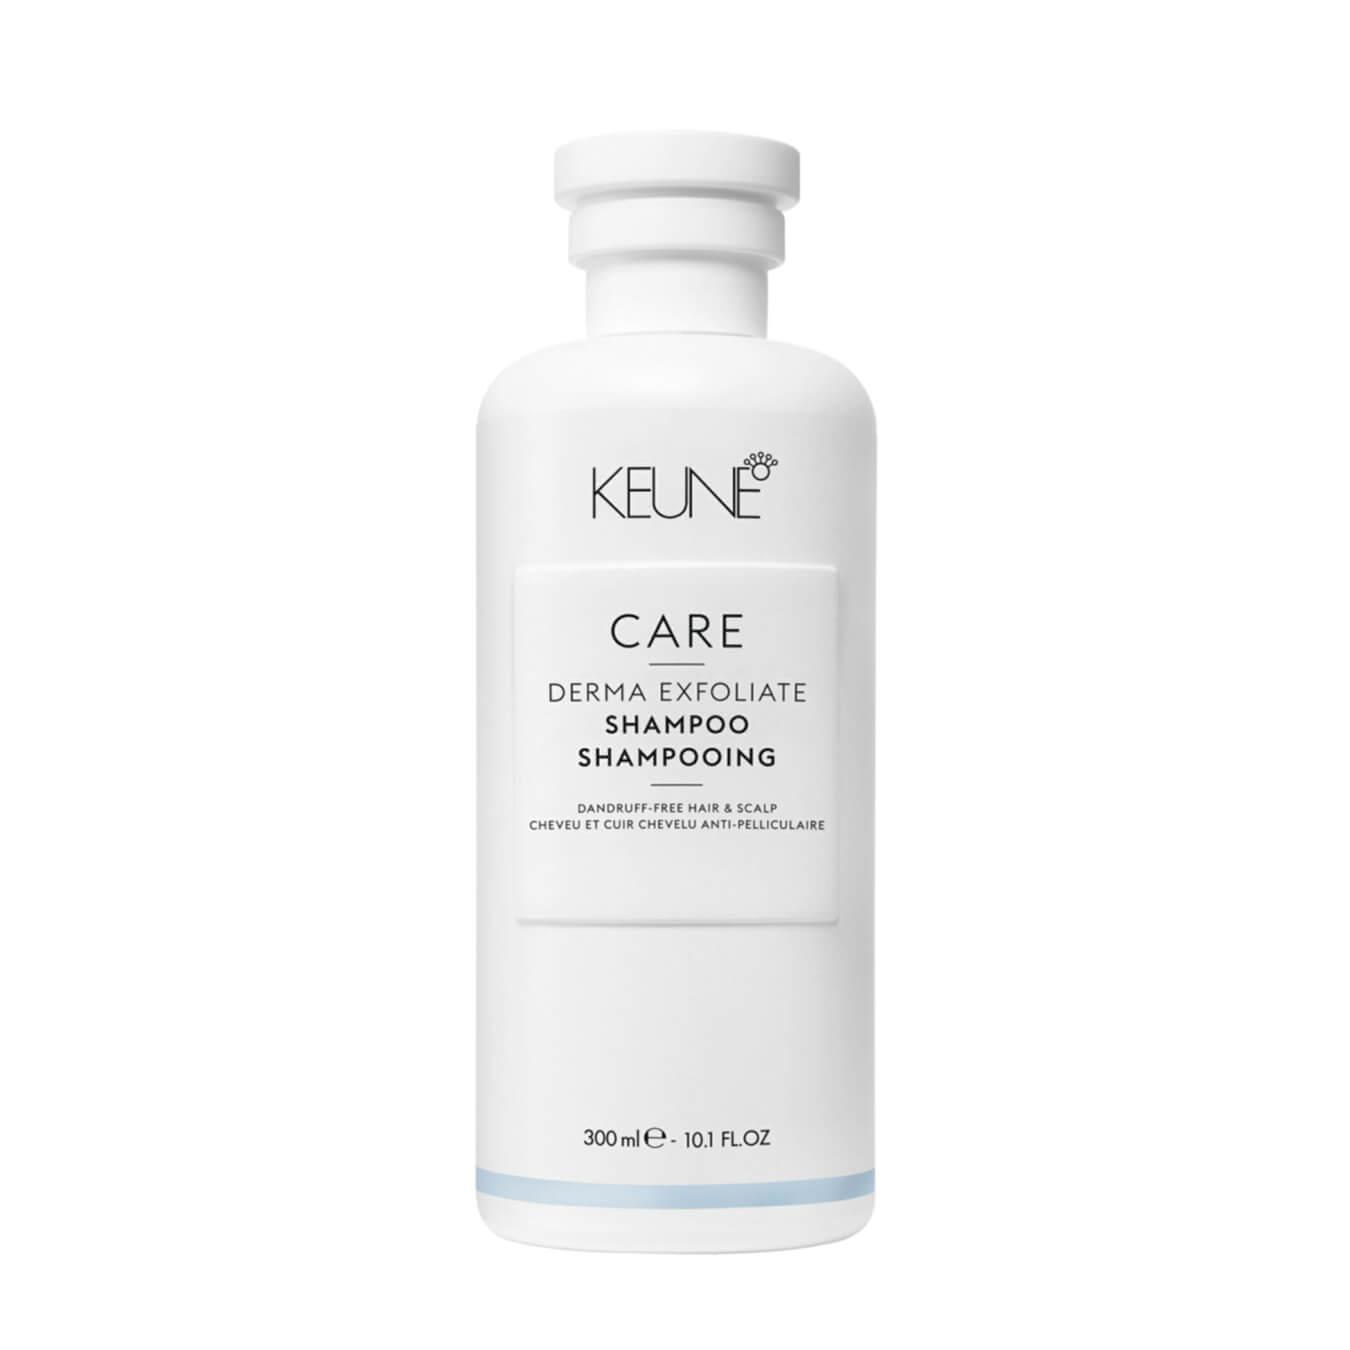 Koop Keune Care Derma Exfoliate Shampoo 300ml